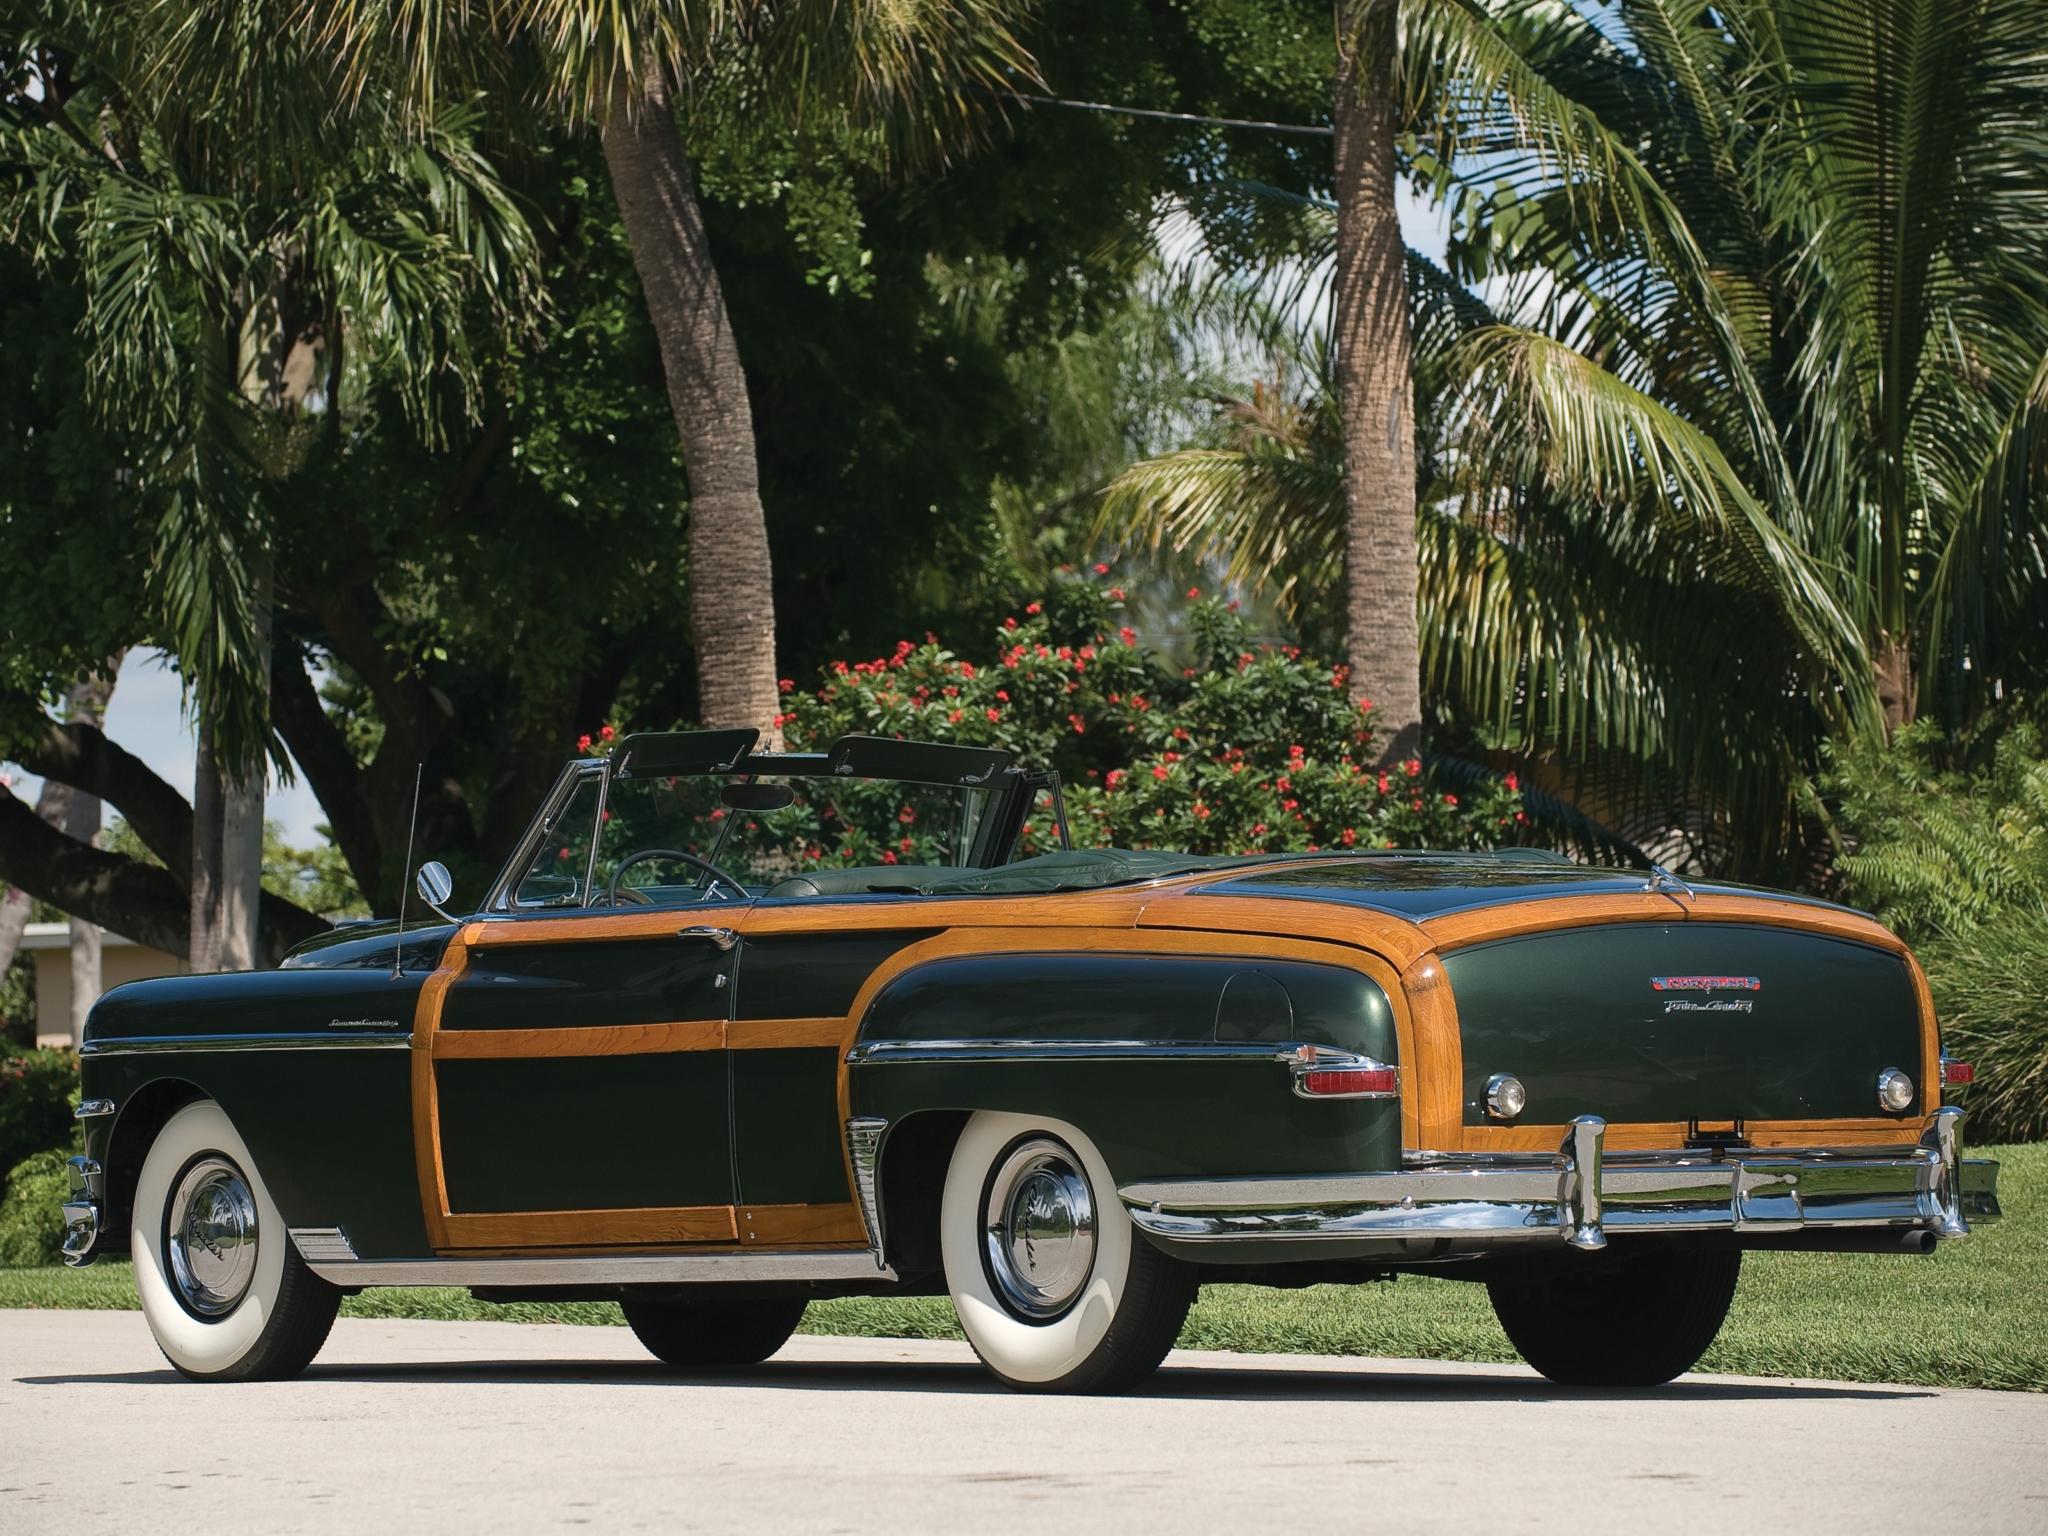 1949 Chrysler Town Country Convertible Retro F Wallpaper 2048x1536 122454 Wallpaperup